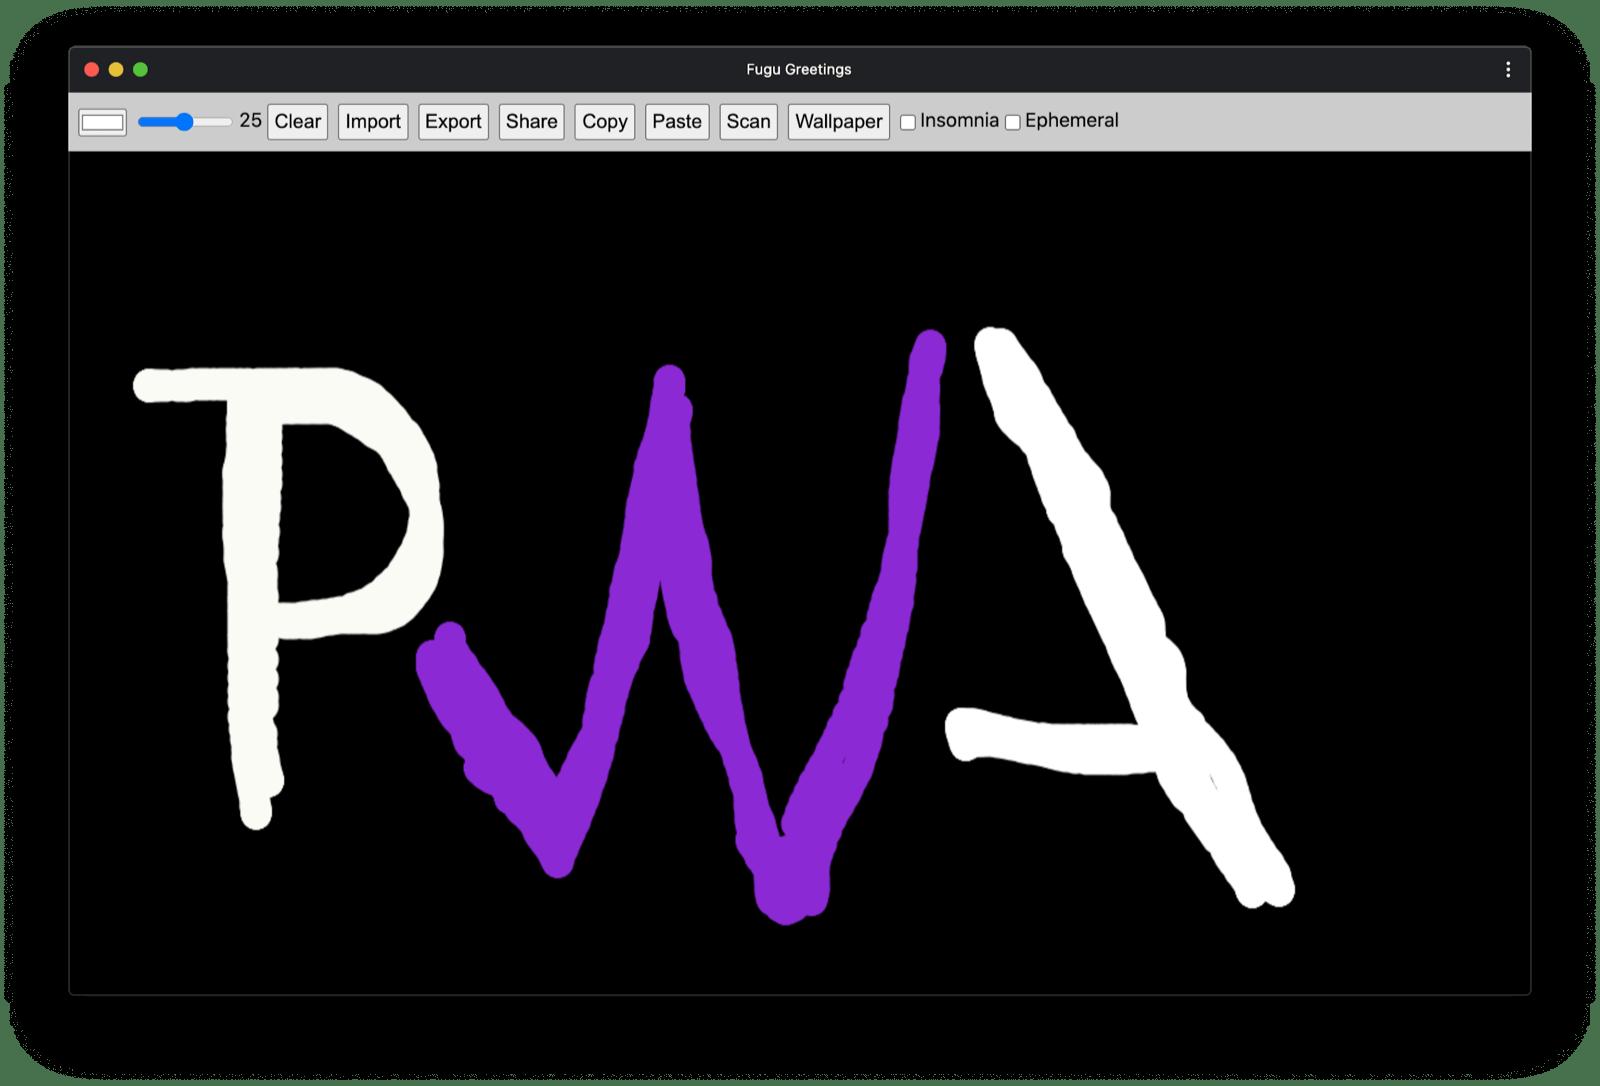 Fugu Greetings PWA with a drawing that resembles the PWA community logo.